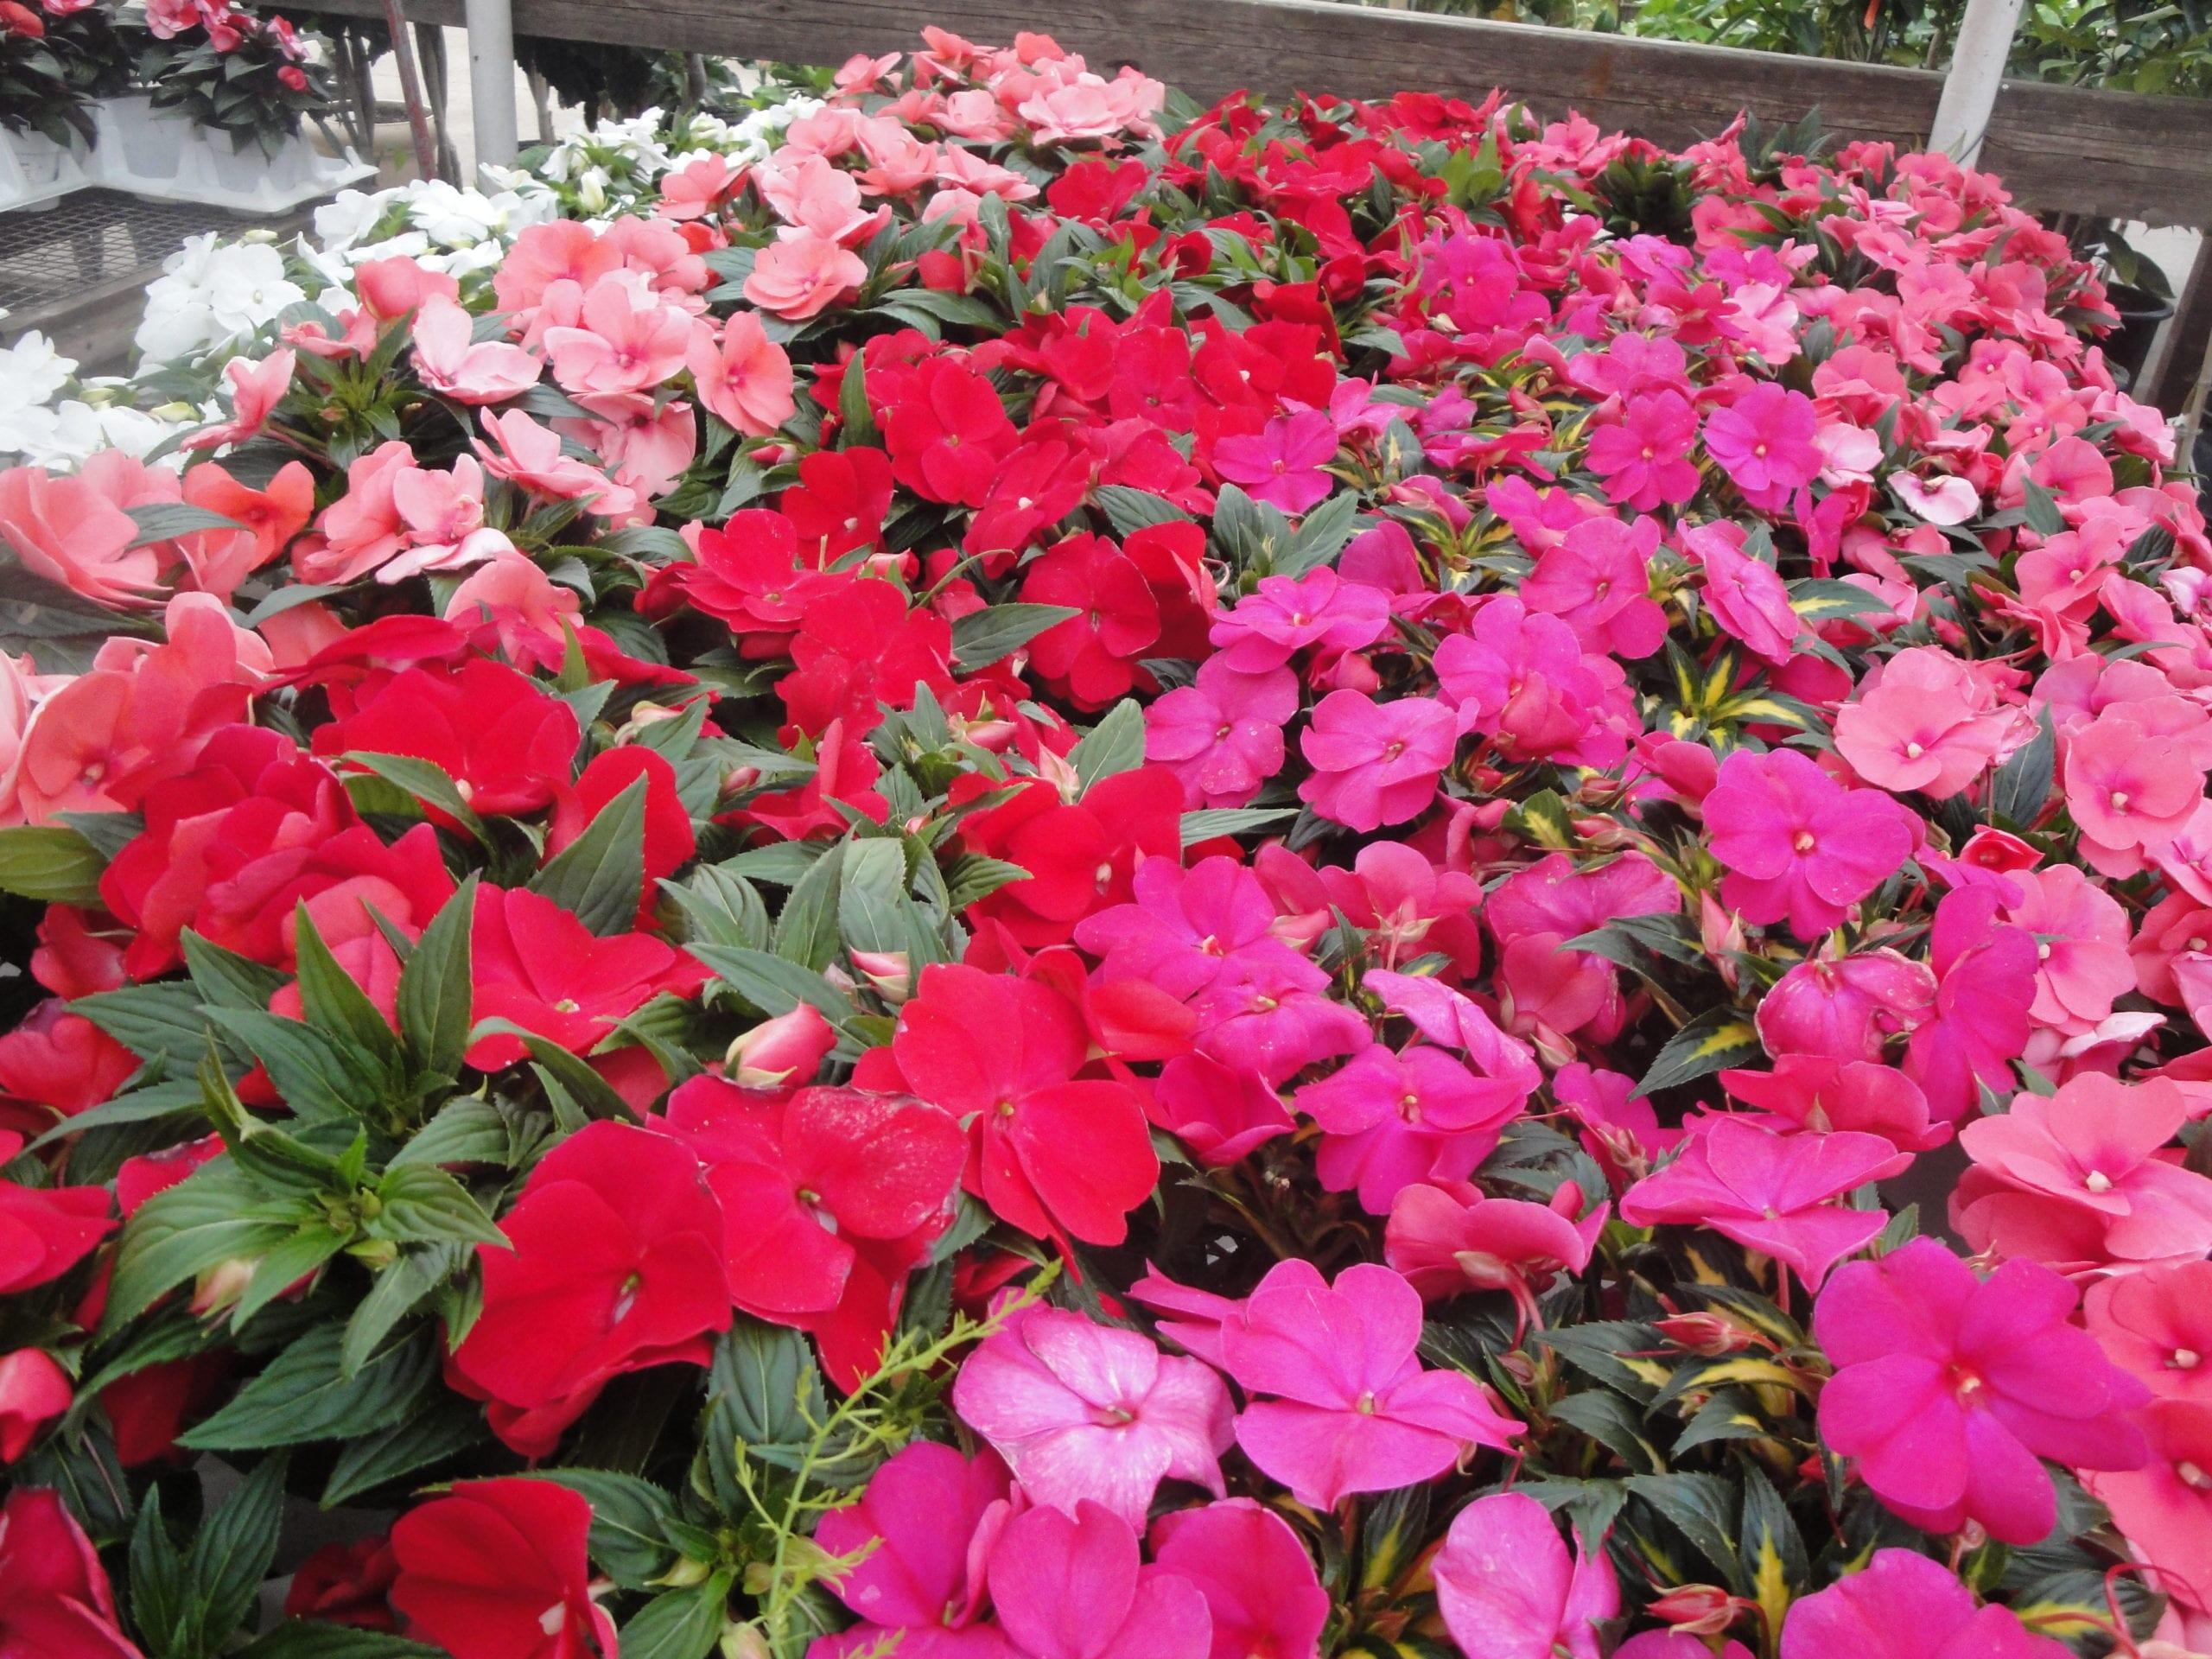 Impatiens at City Floral Garden Center